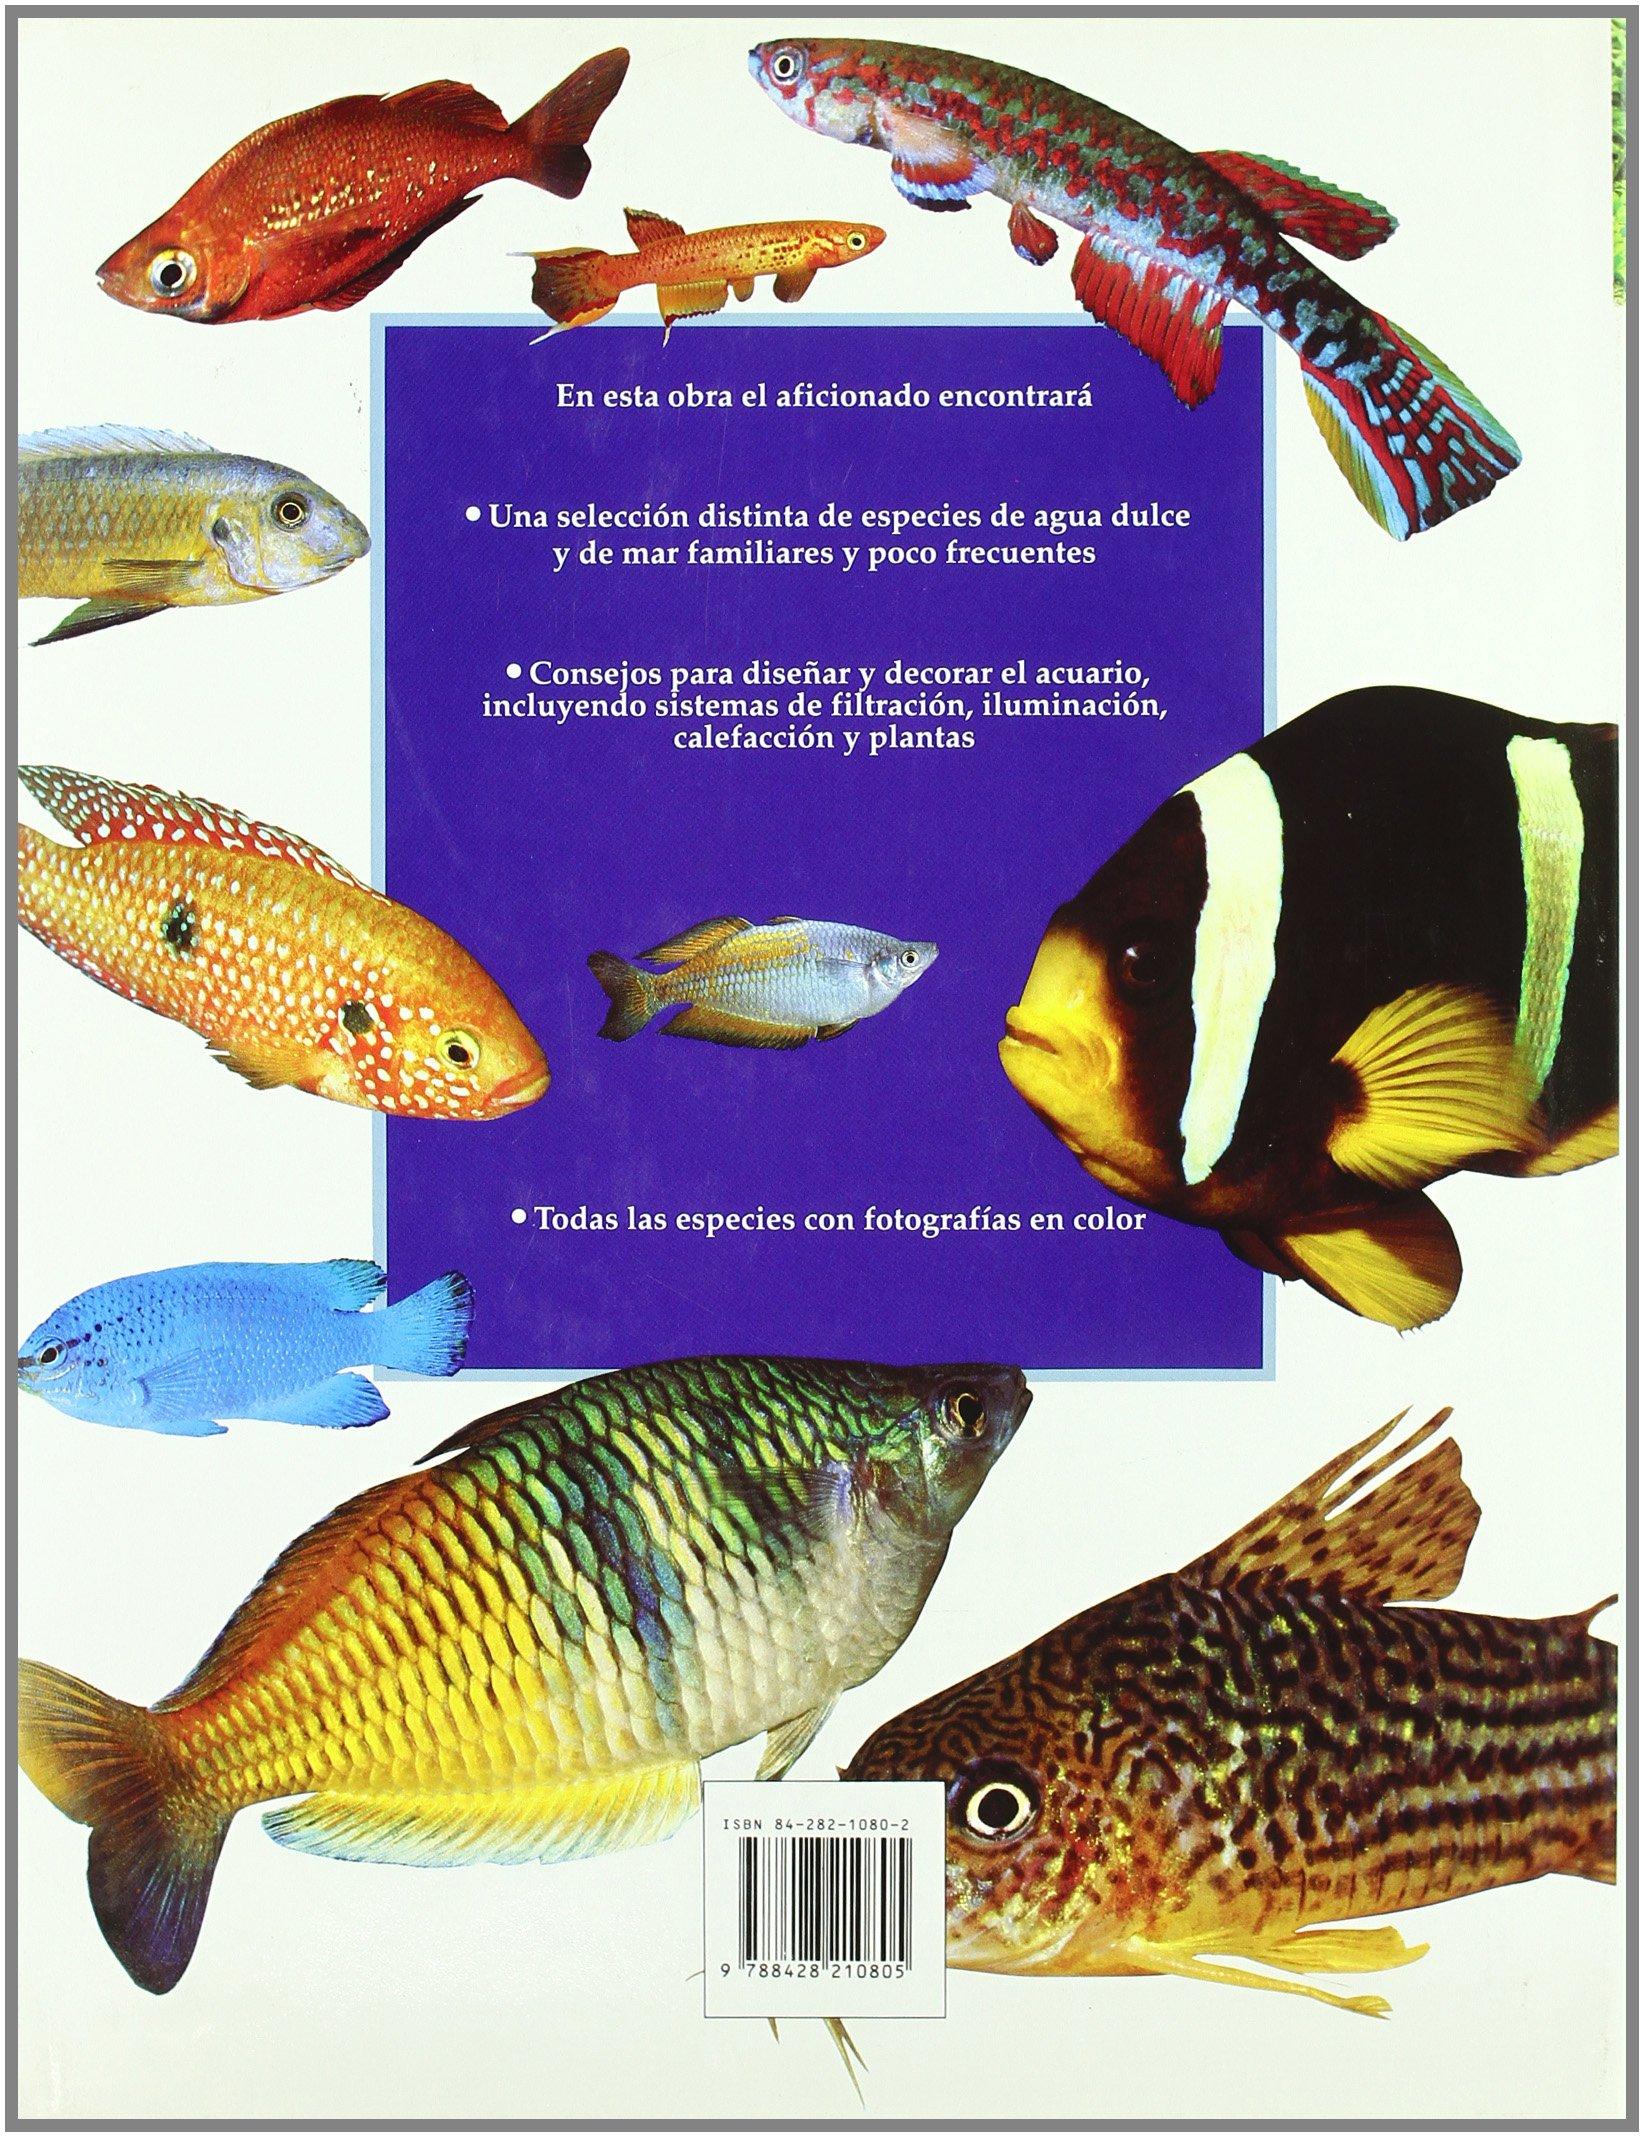 Peces de acuario : una guía completa de peces exóticos de agua dulce y de agua de mar: GINA SANDFORD: 9788428210805: Amazon.com: Books